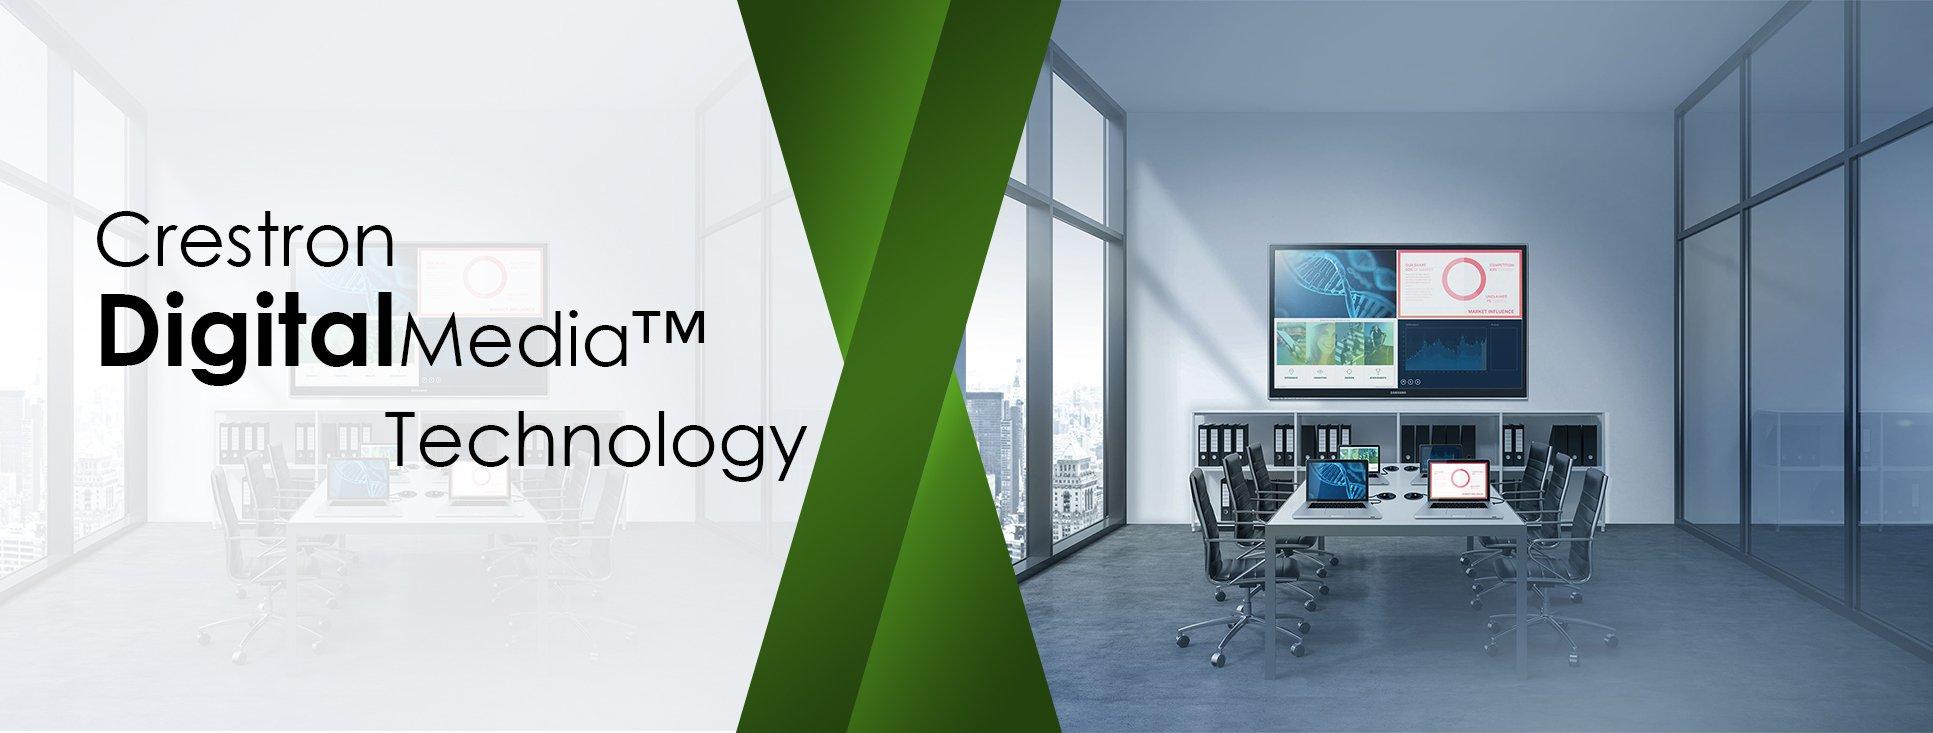 Crestron DigitalMedia™ Technology